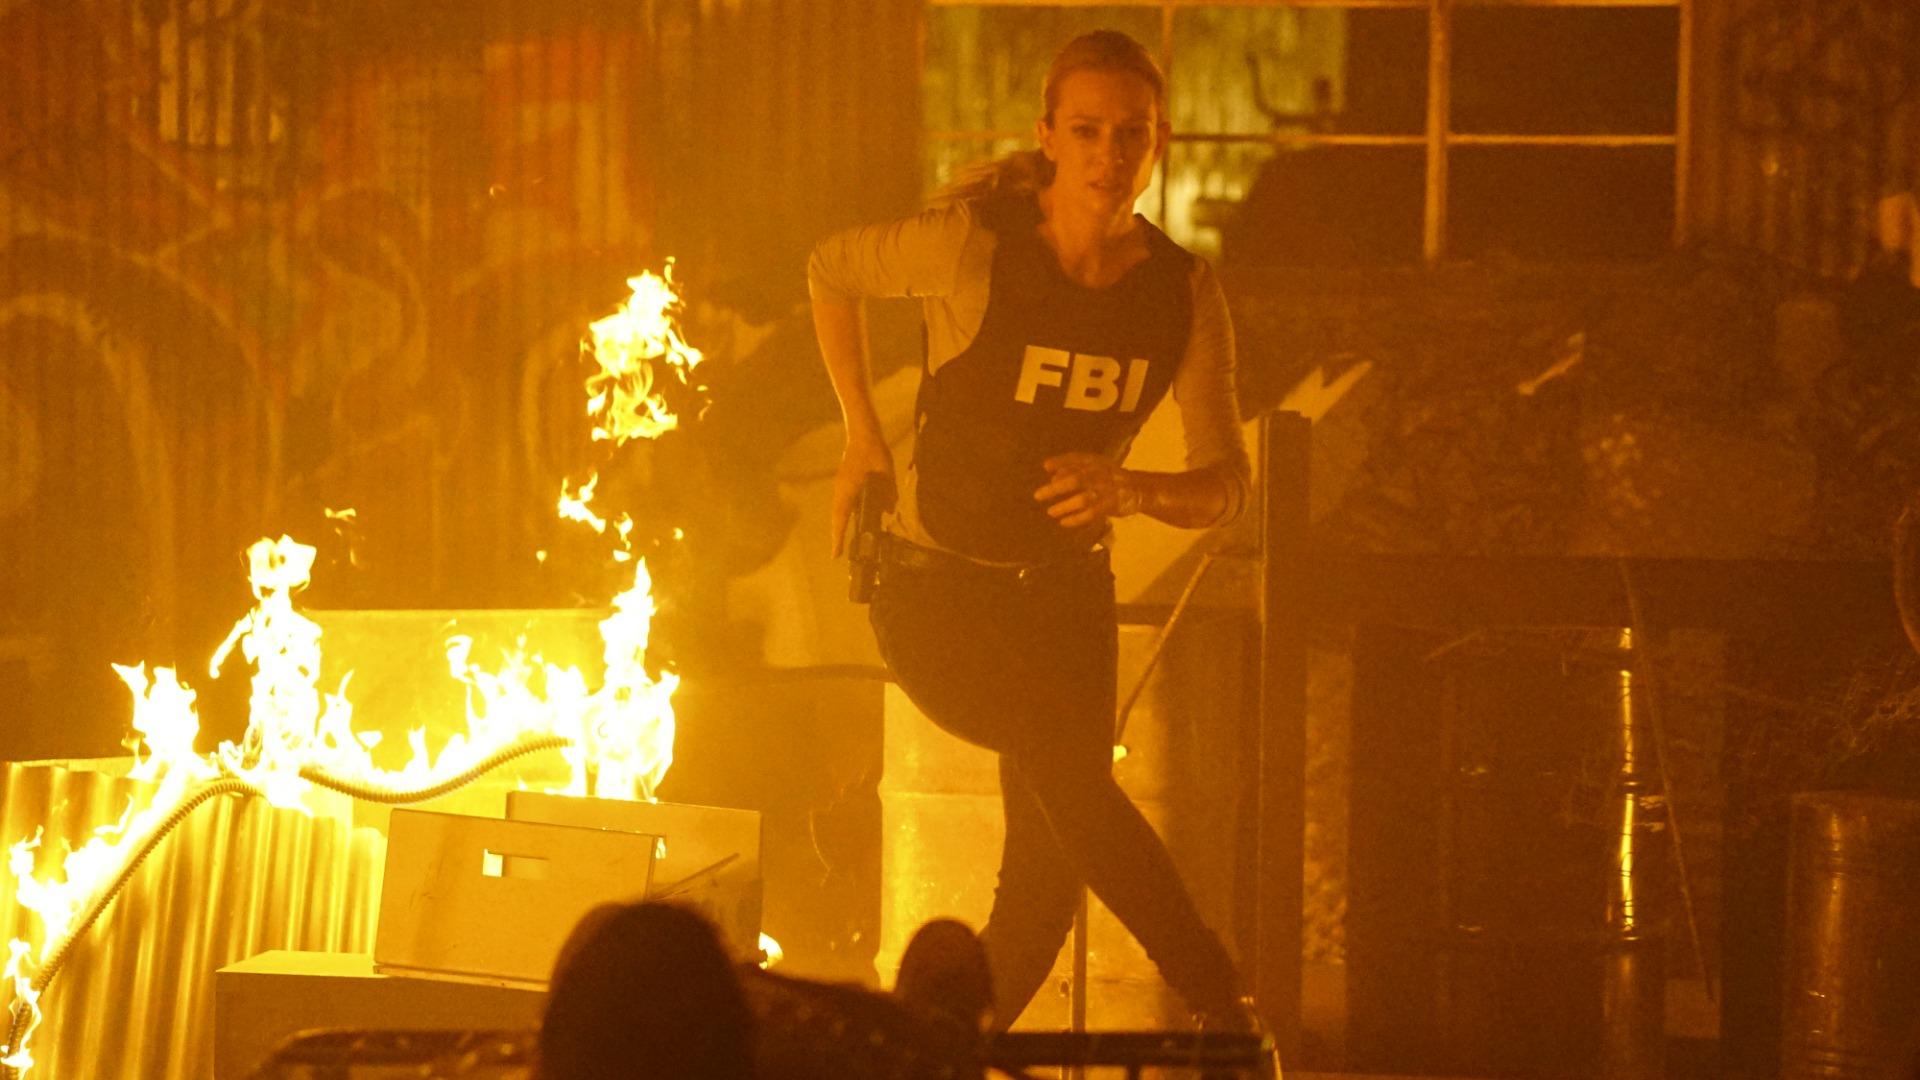 SSA Jennifer Jareau races through the climbing flames.